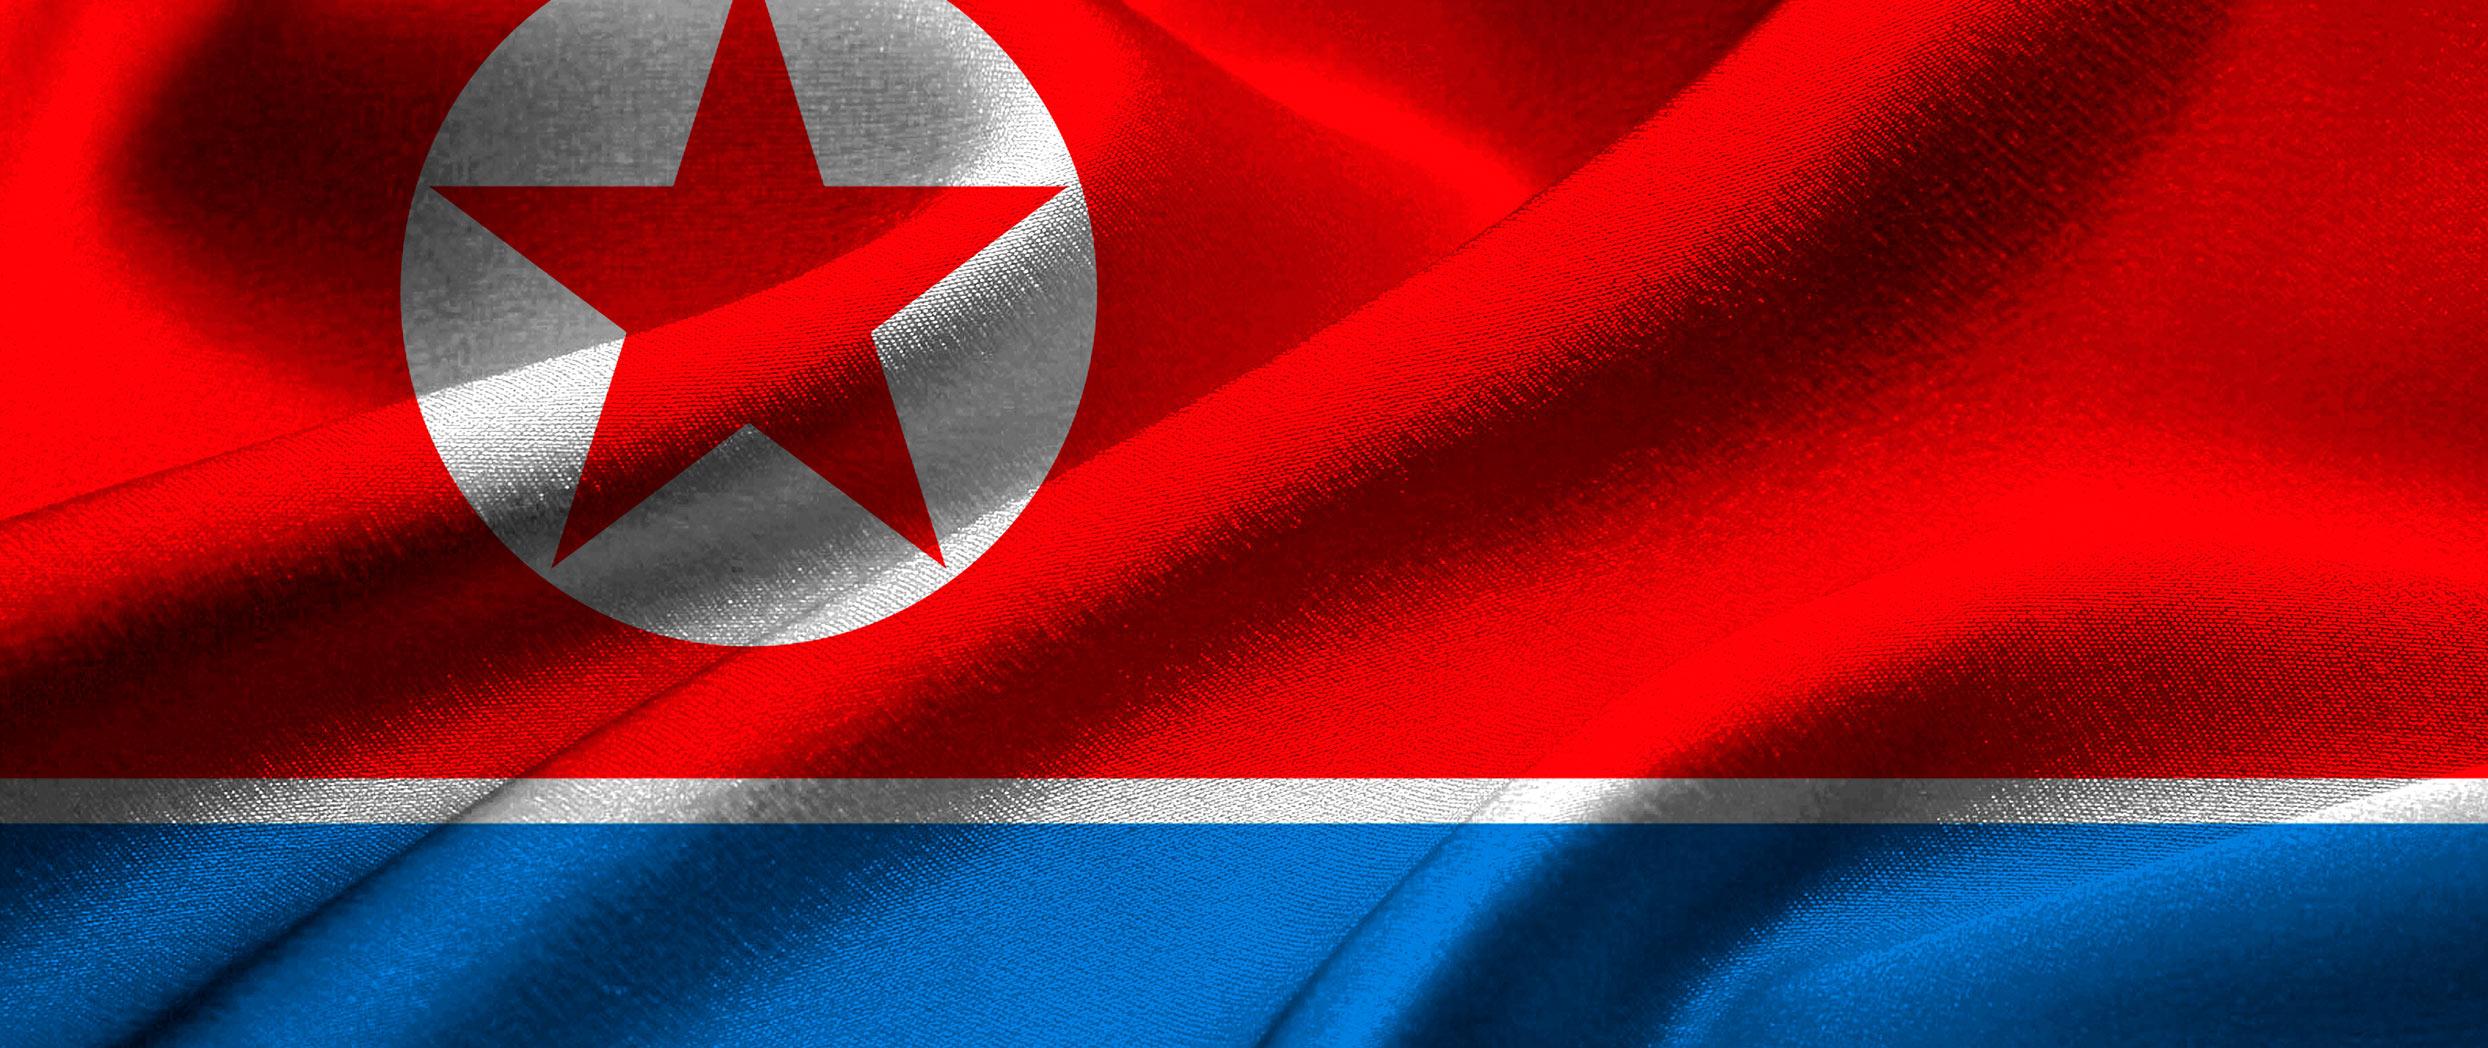 North Korea's Kimsuky and Bureau 121 possess new cyber espionage tools